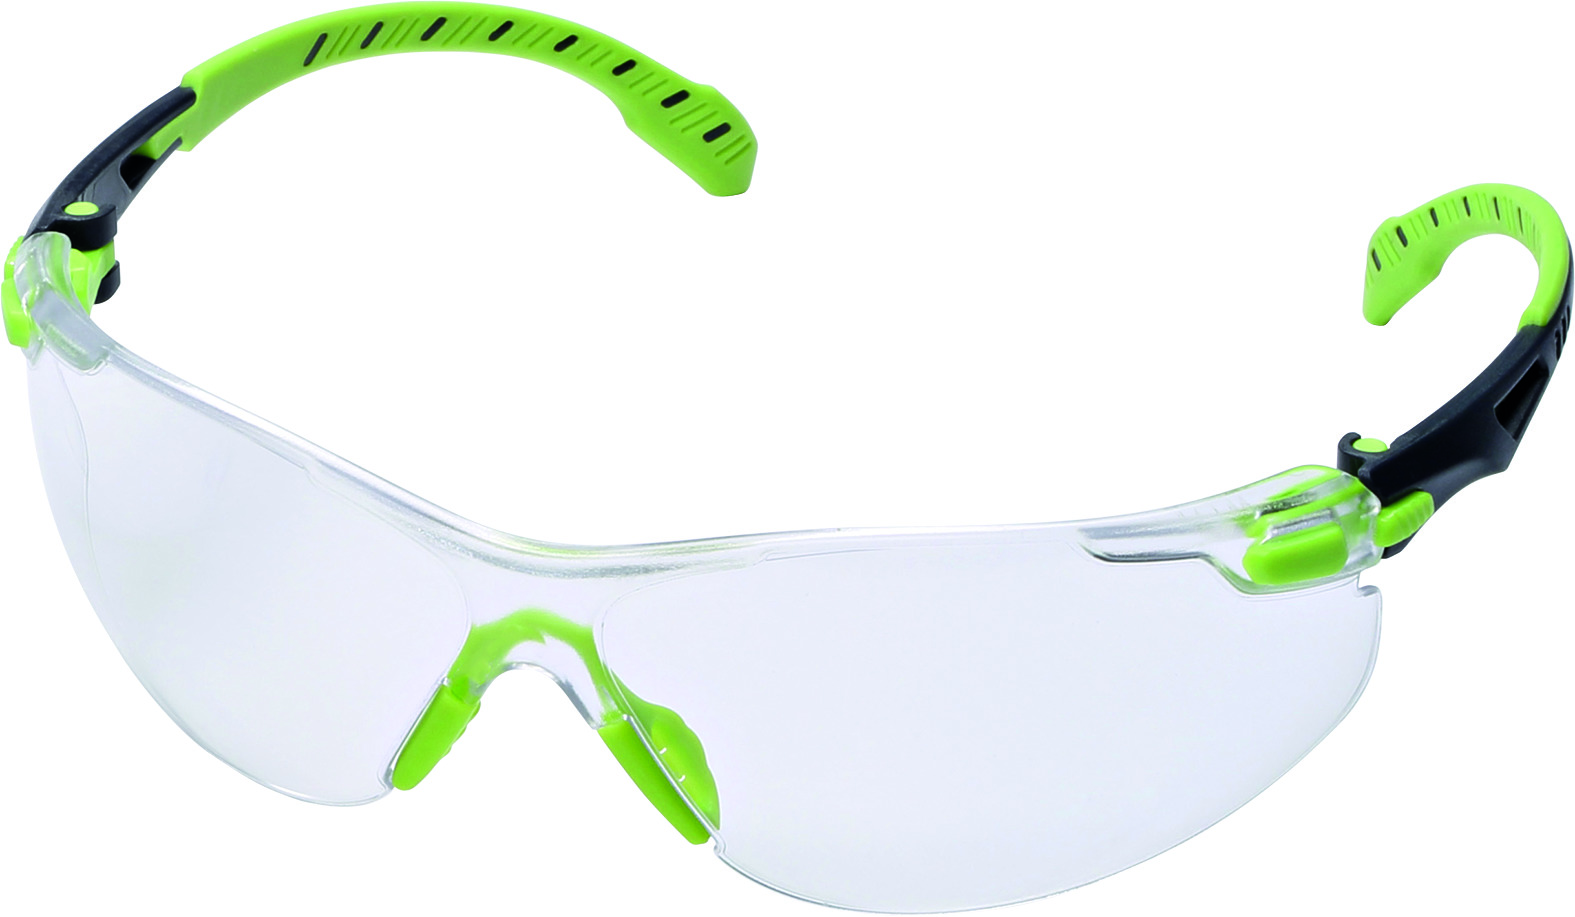 Occhiali di protezione 3M SOLUS 1000